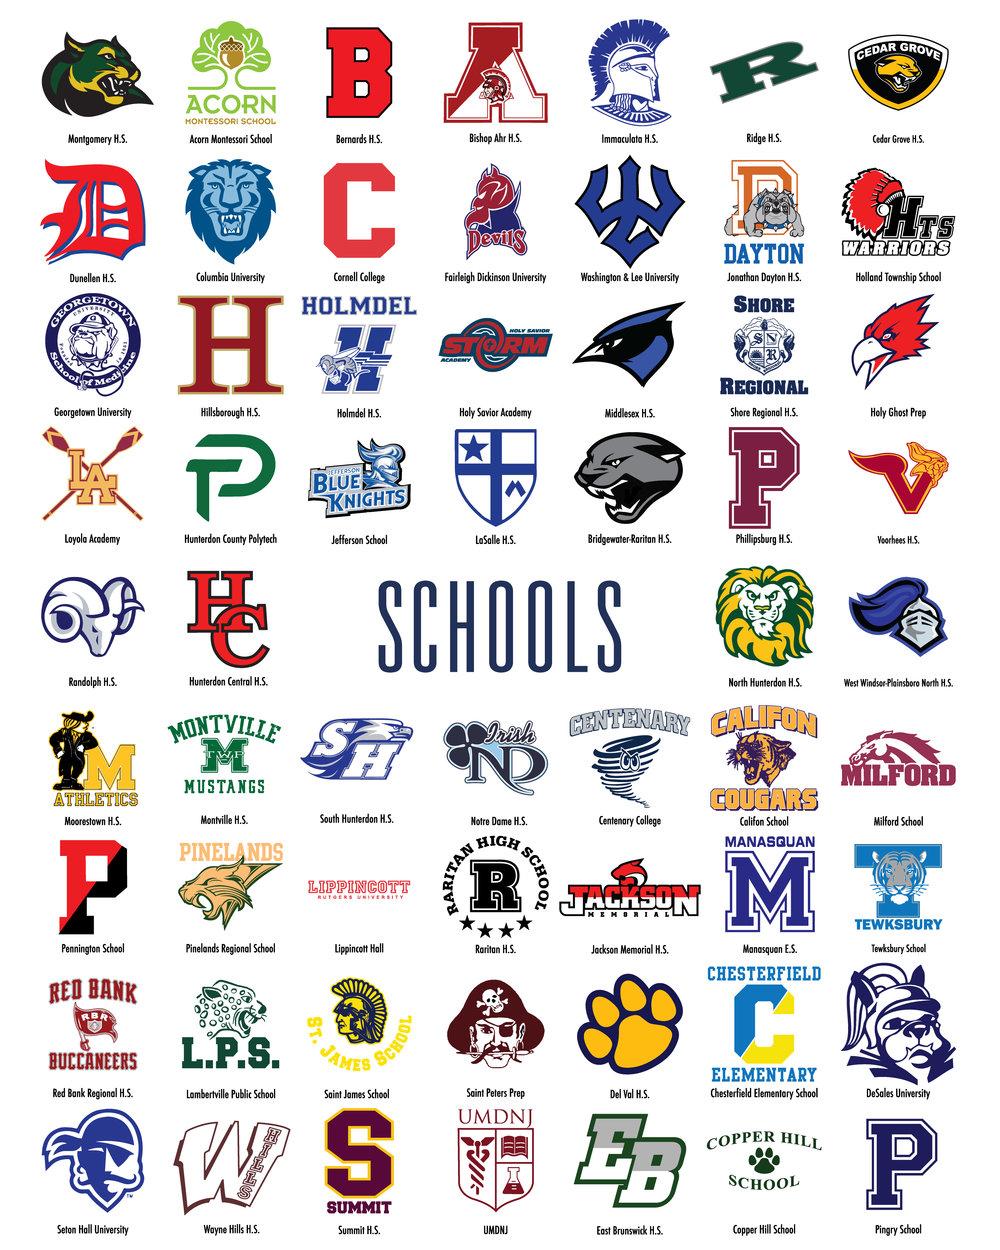 SP_WallMOCK_Schools_Wall_5-05-17.jpg